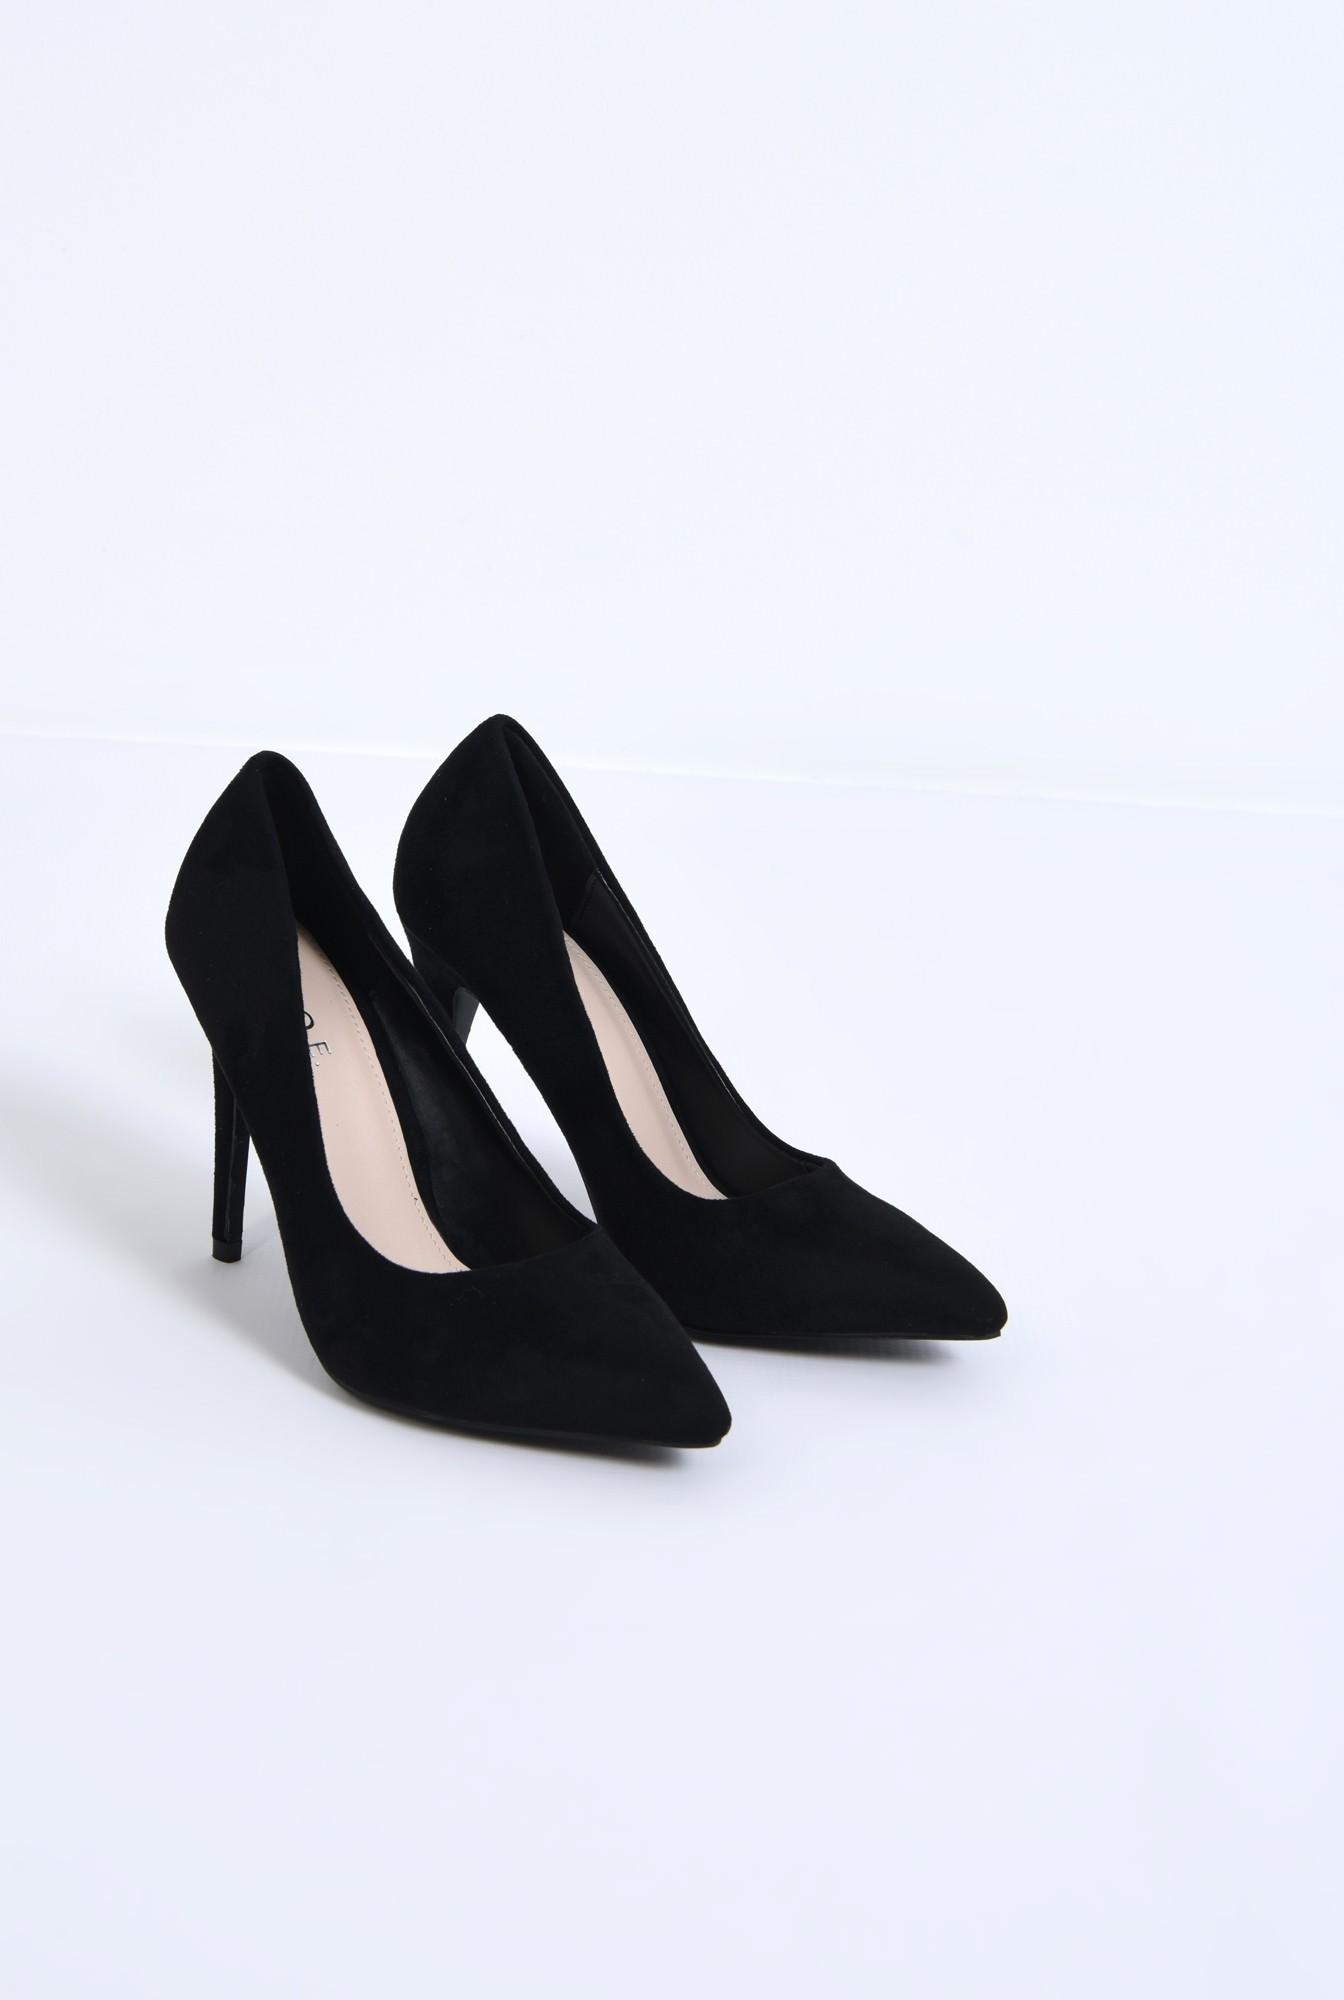 1 - pantofi casual, negru, stiletto